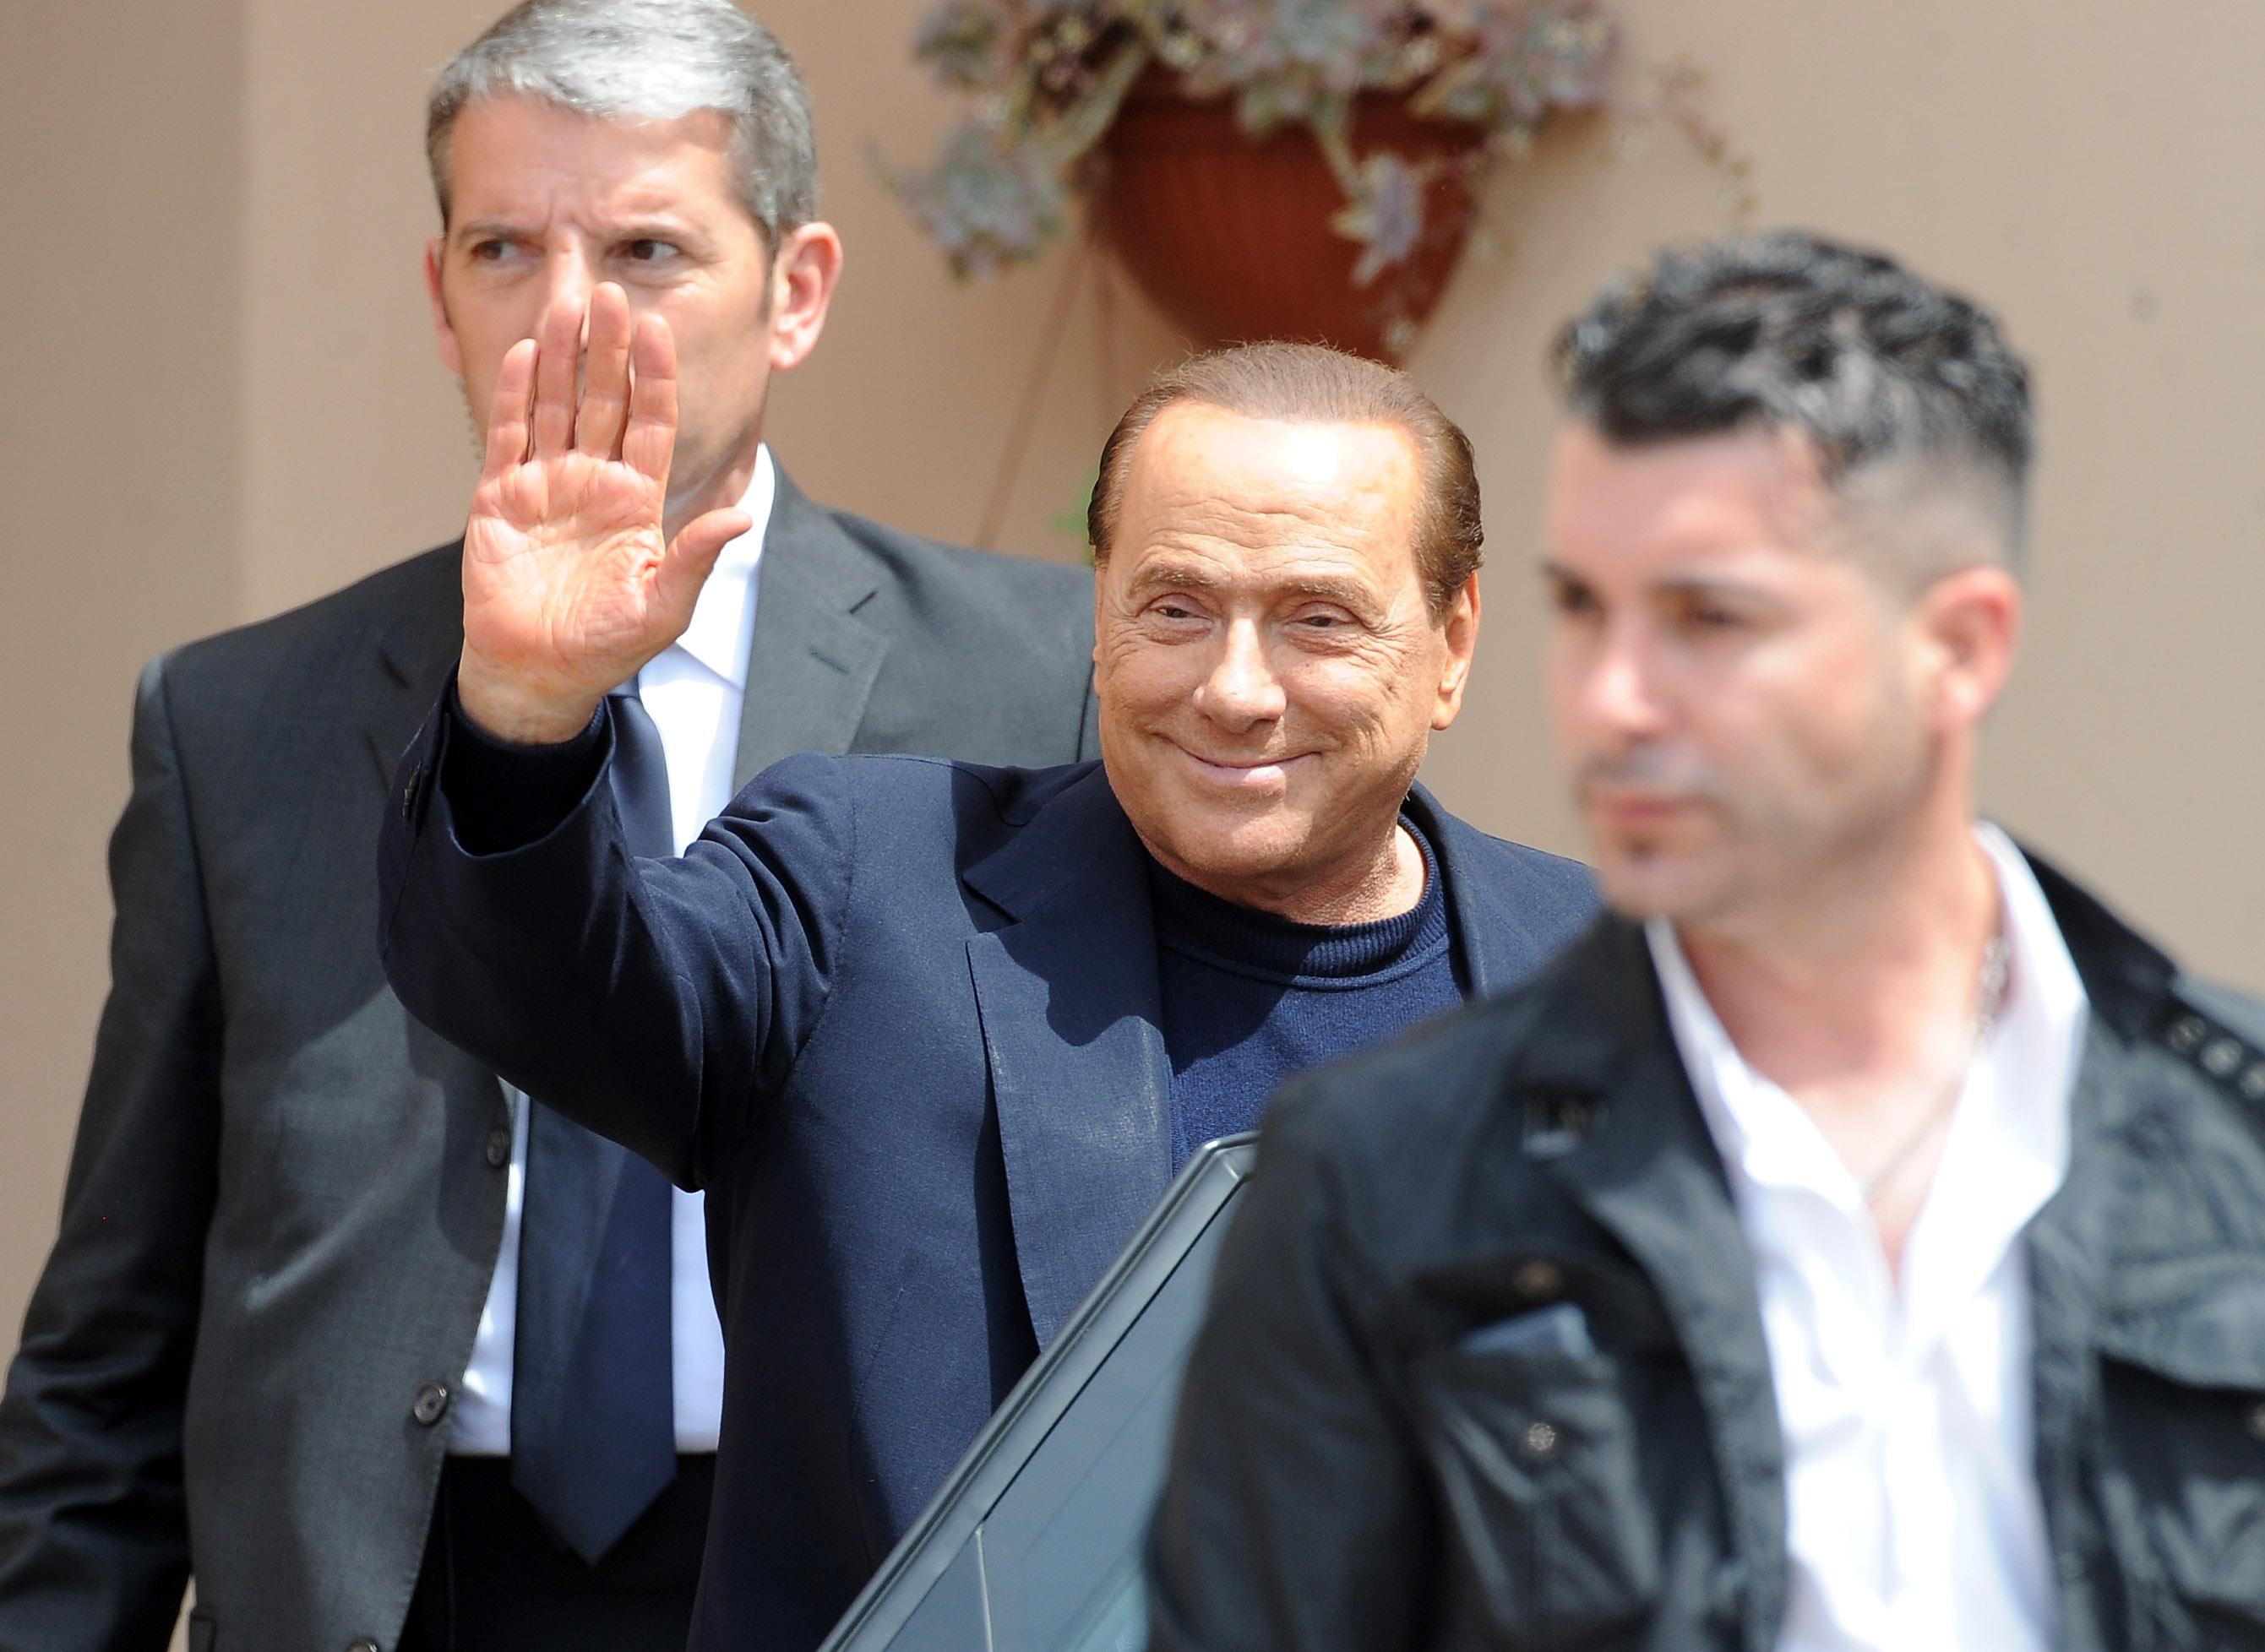 Berlusconi leaves the Fondazione Sacra Famiglia on May 9, 2014 in Milan, Italy.